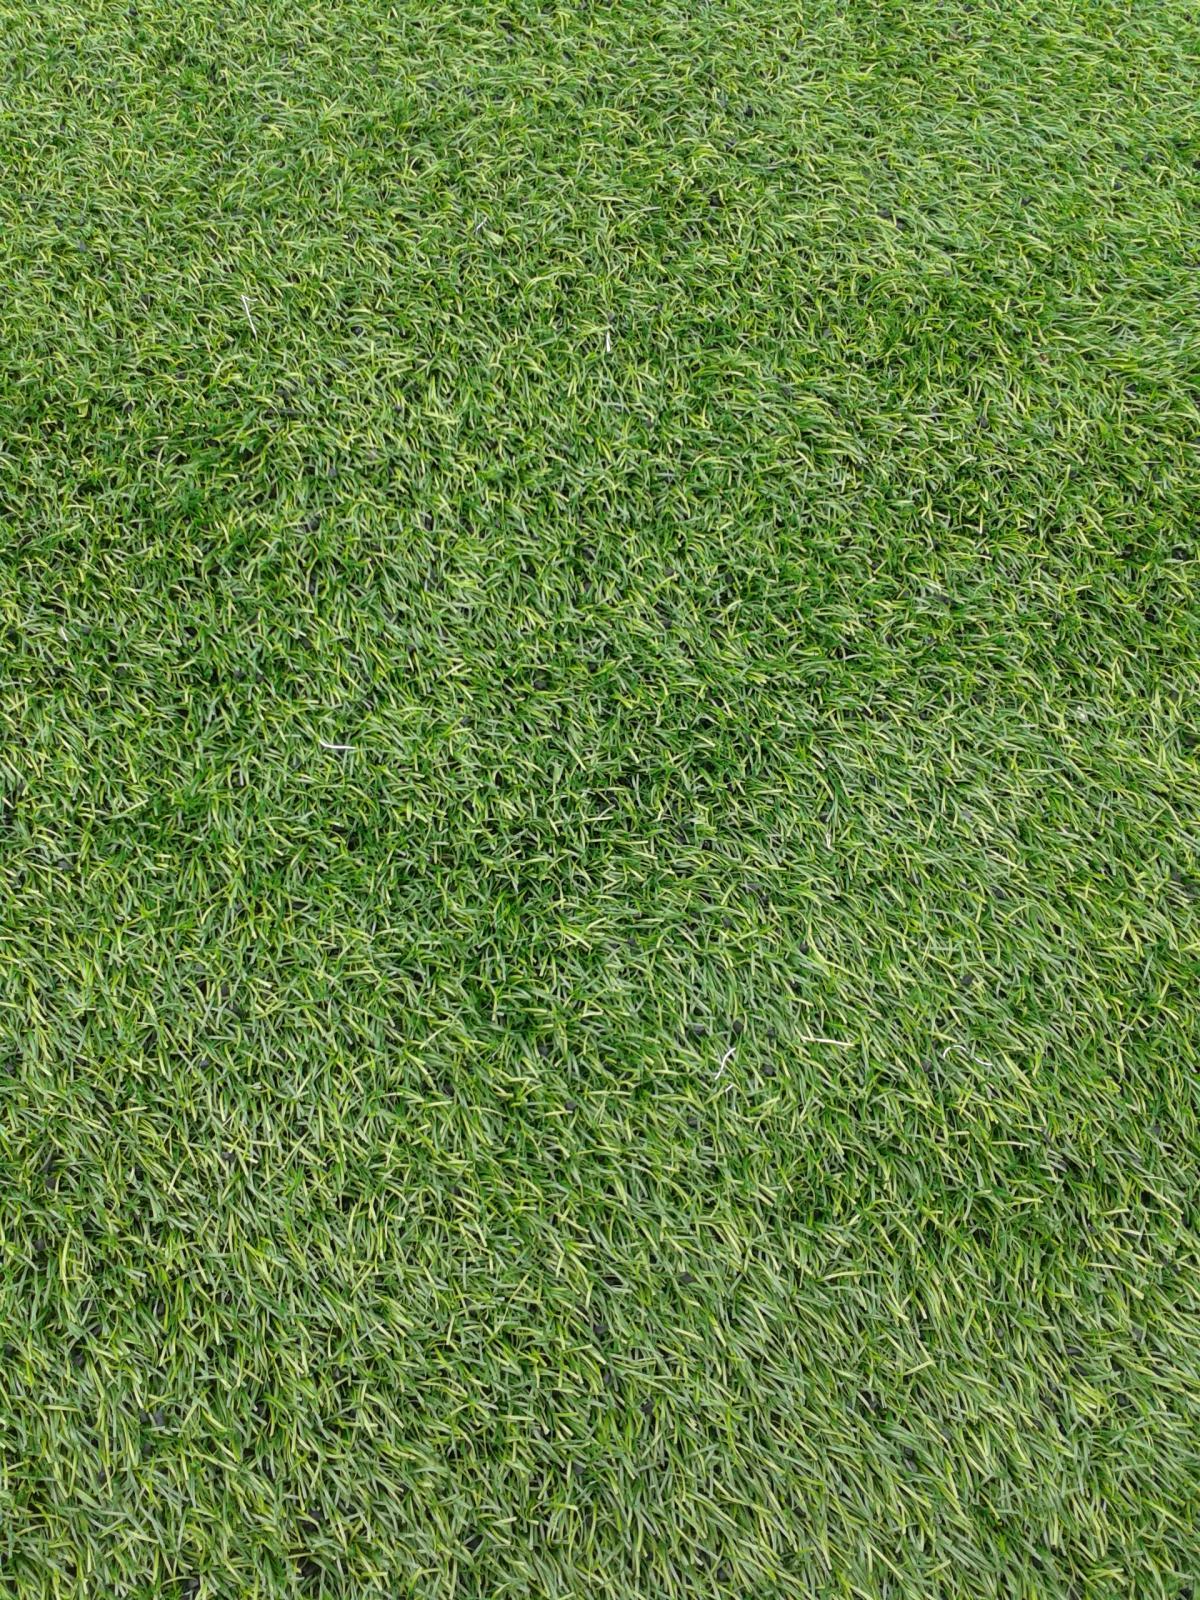 Yard Grass Greenery #143871